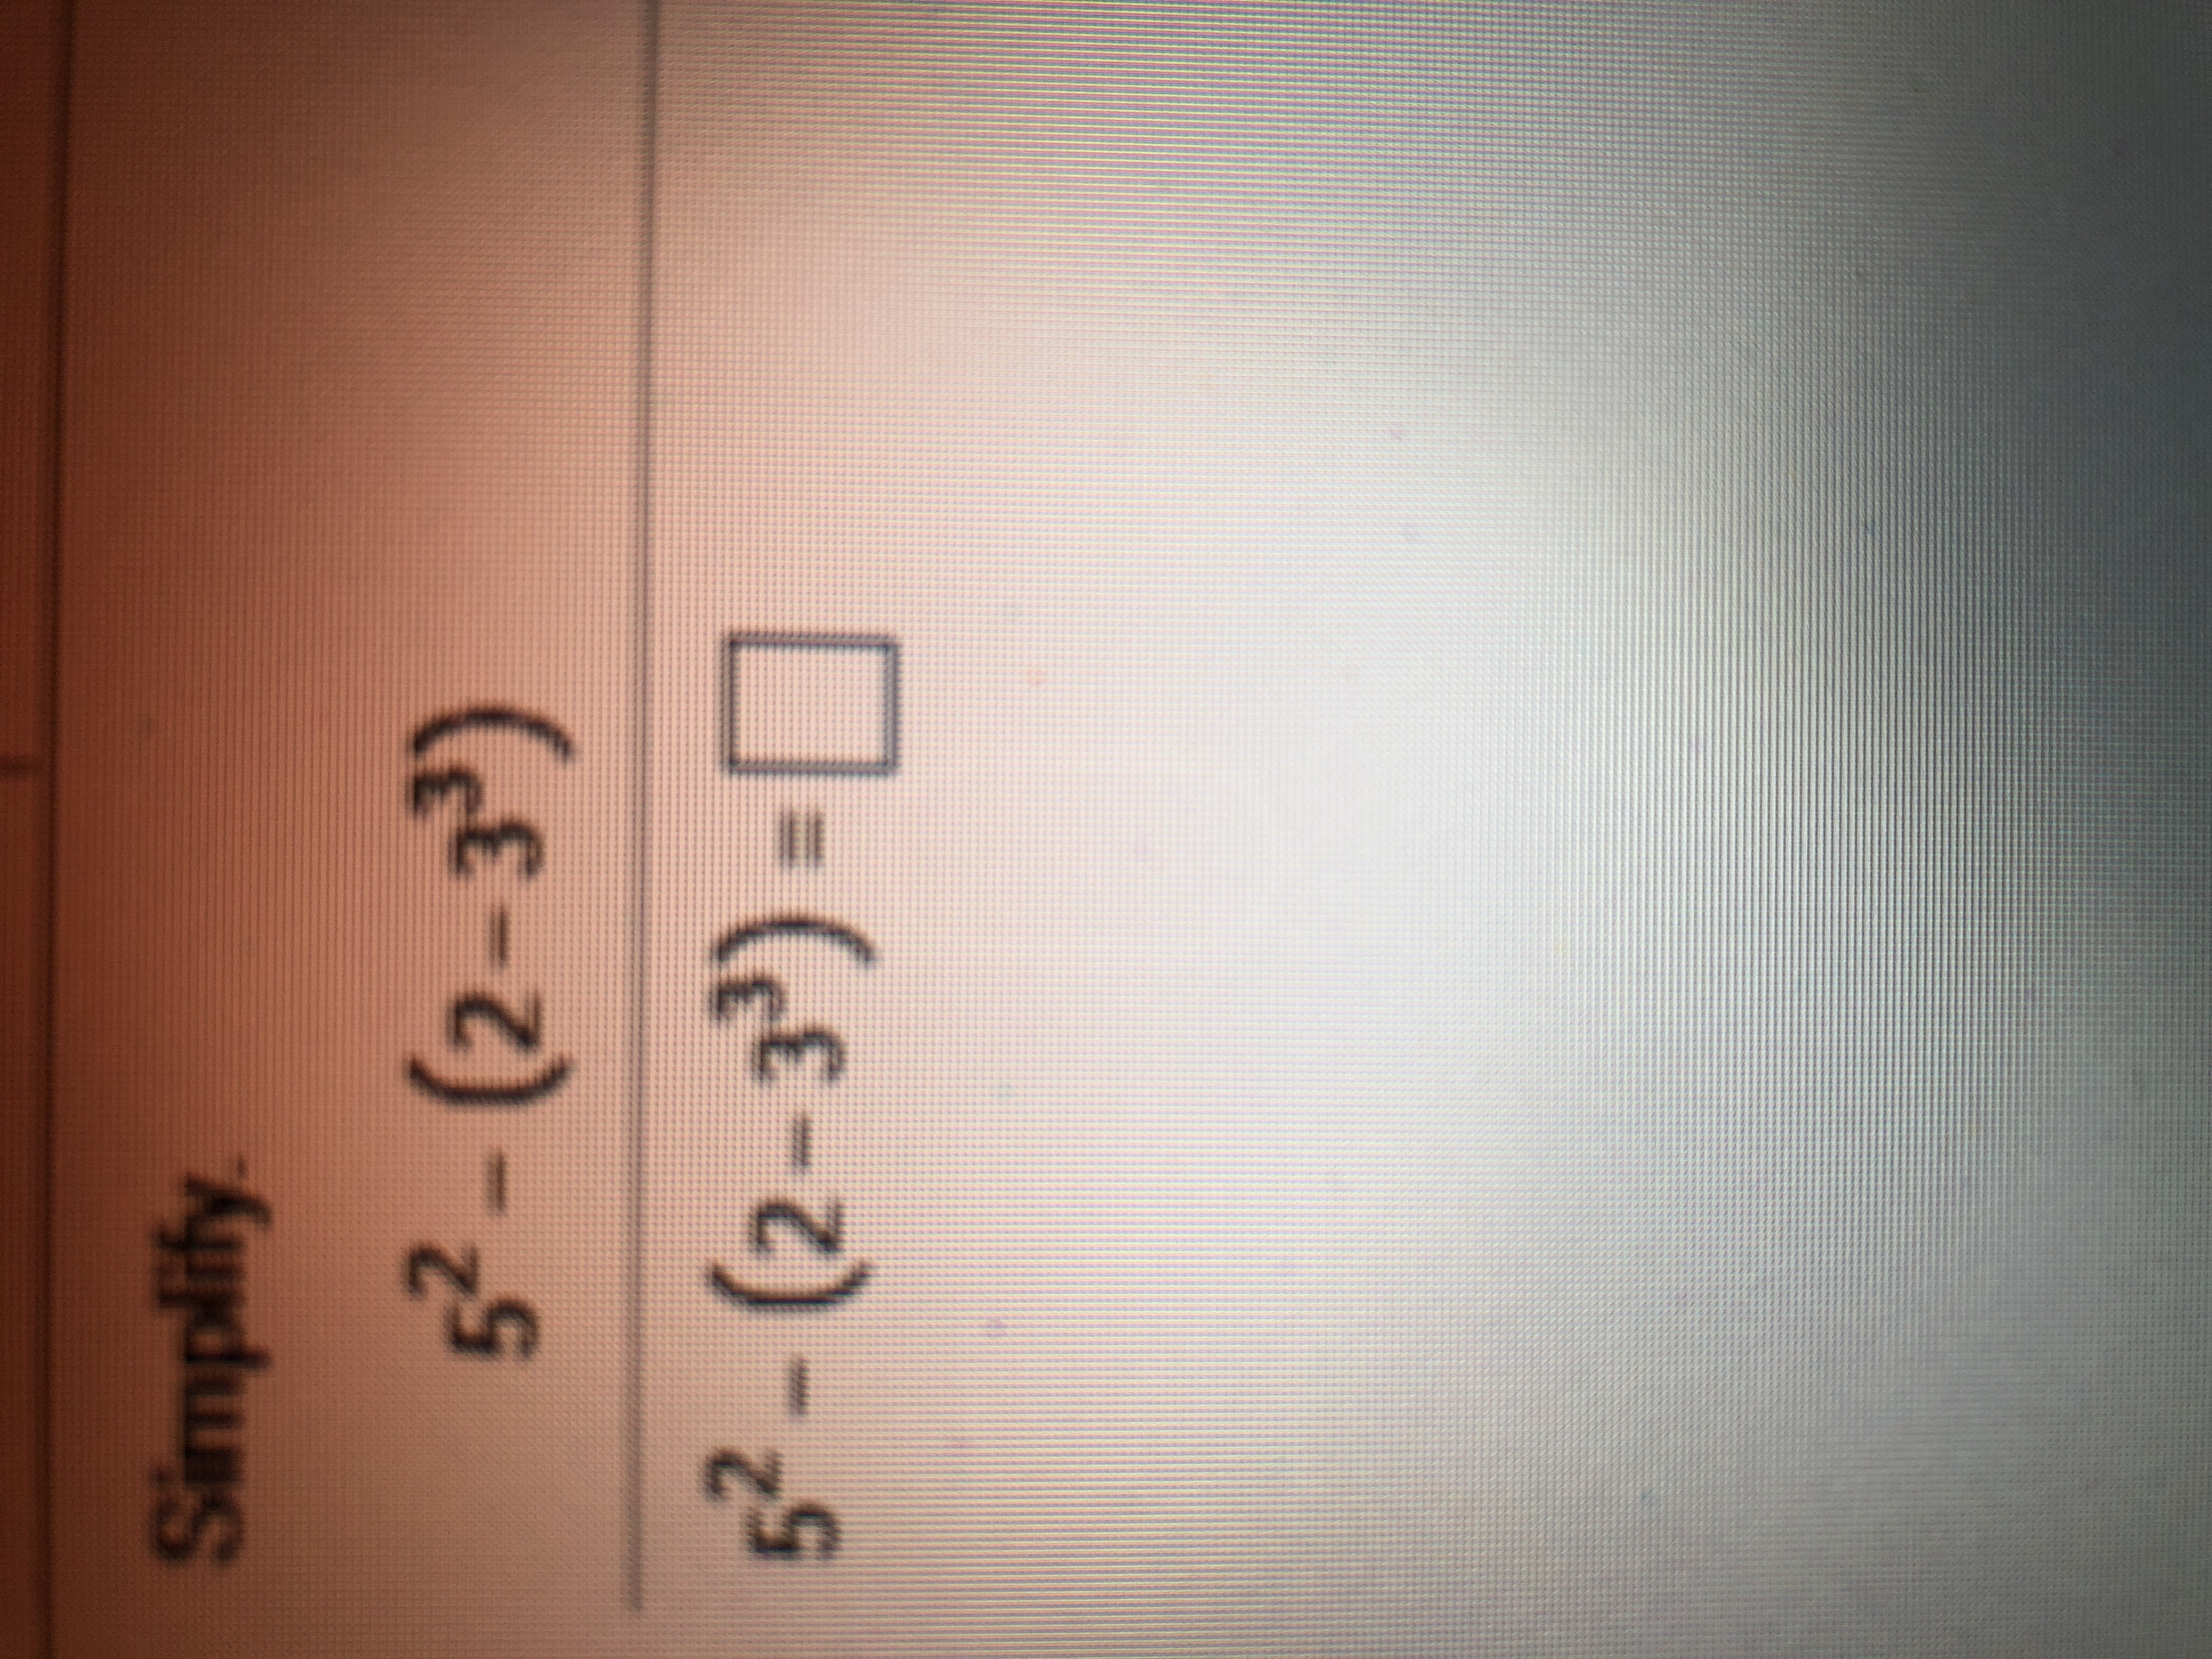 Simplify 52- (2-3') 52- (2-33)=